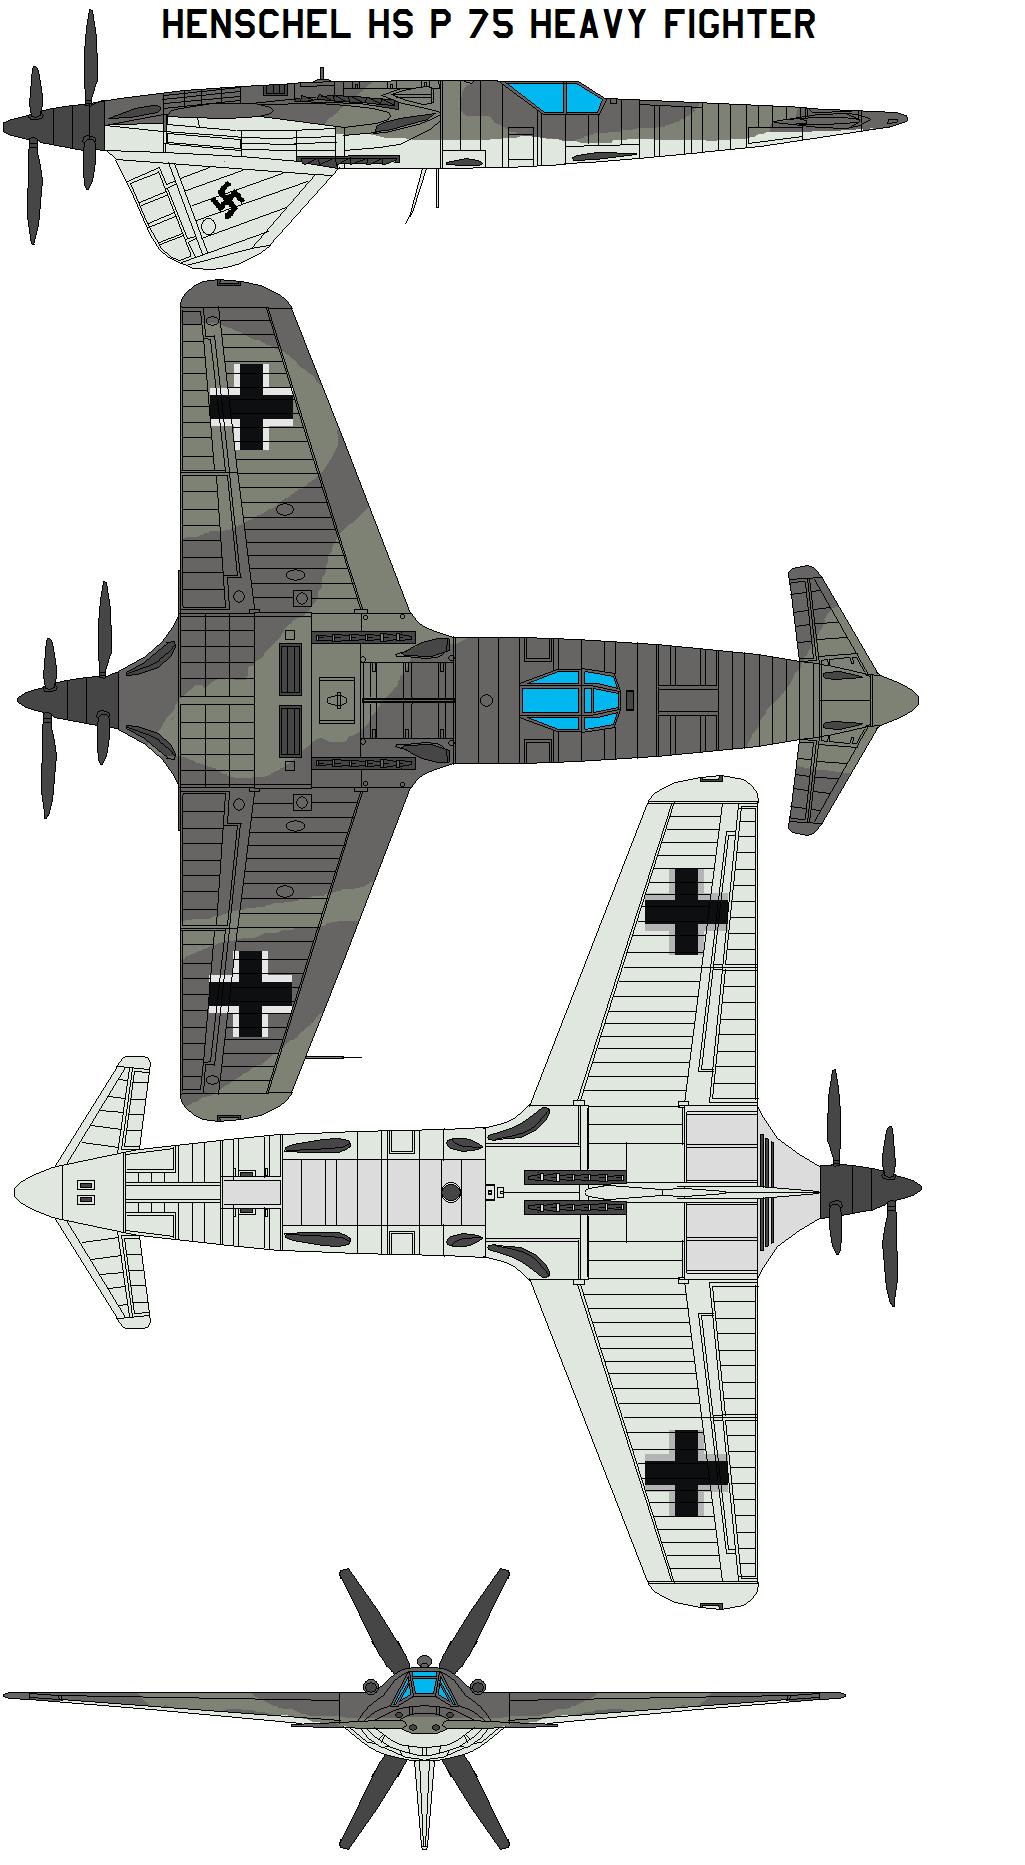 Henschel Hs P 75 Heavy Fighter by bagera3005